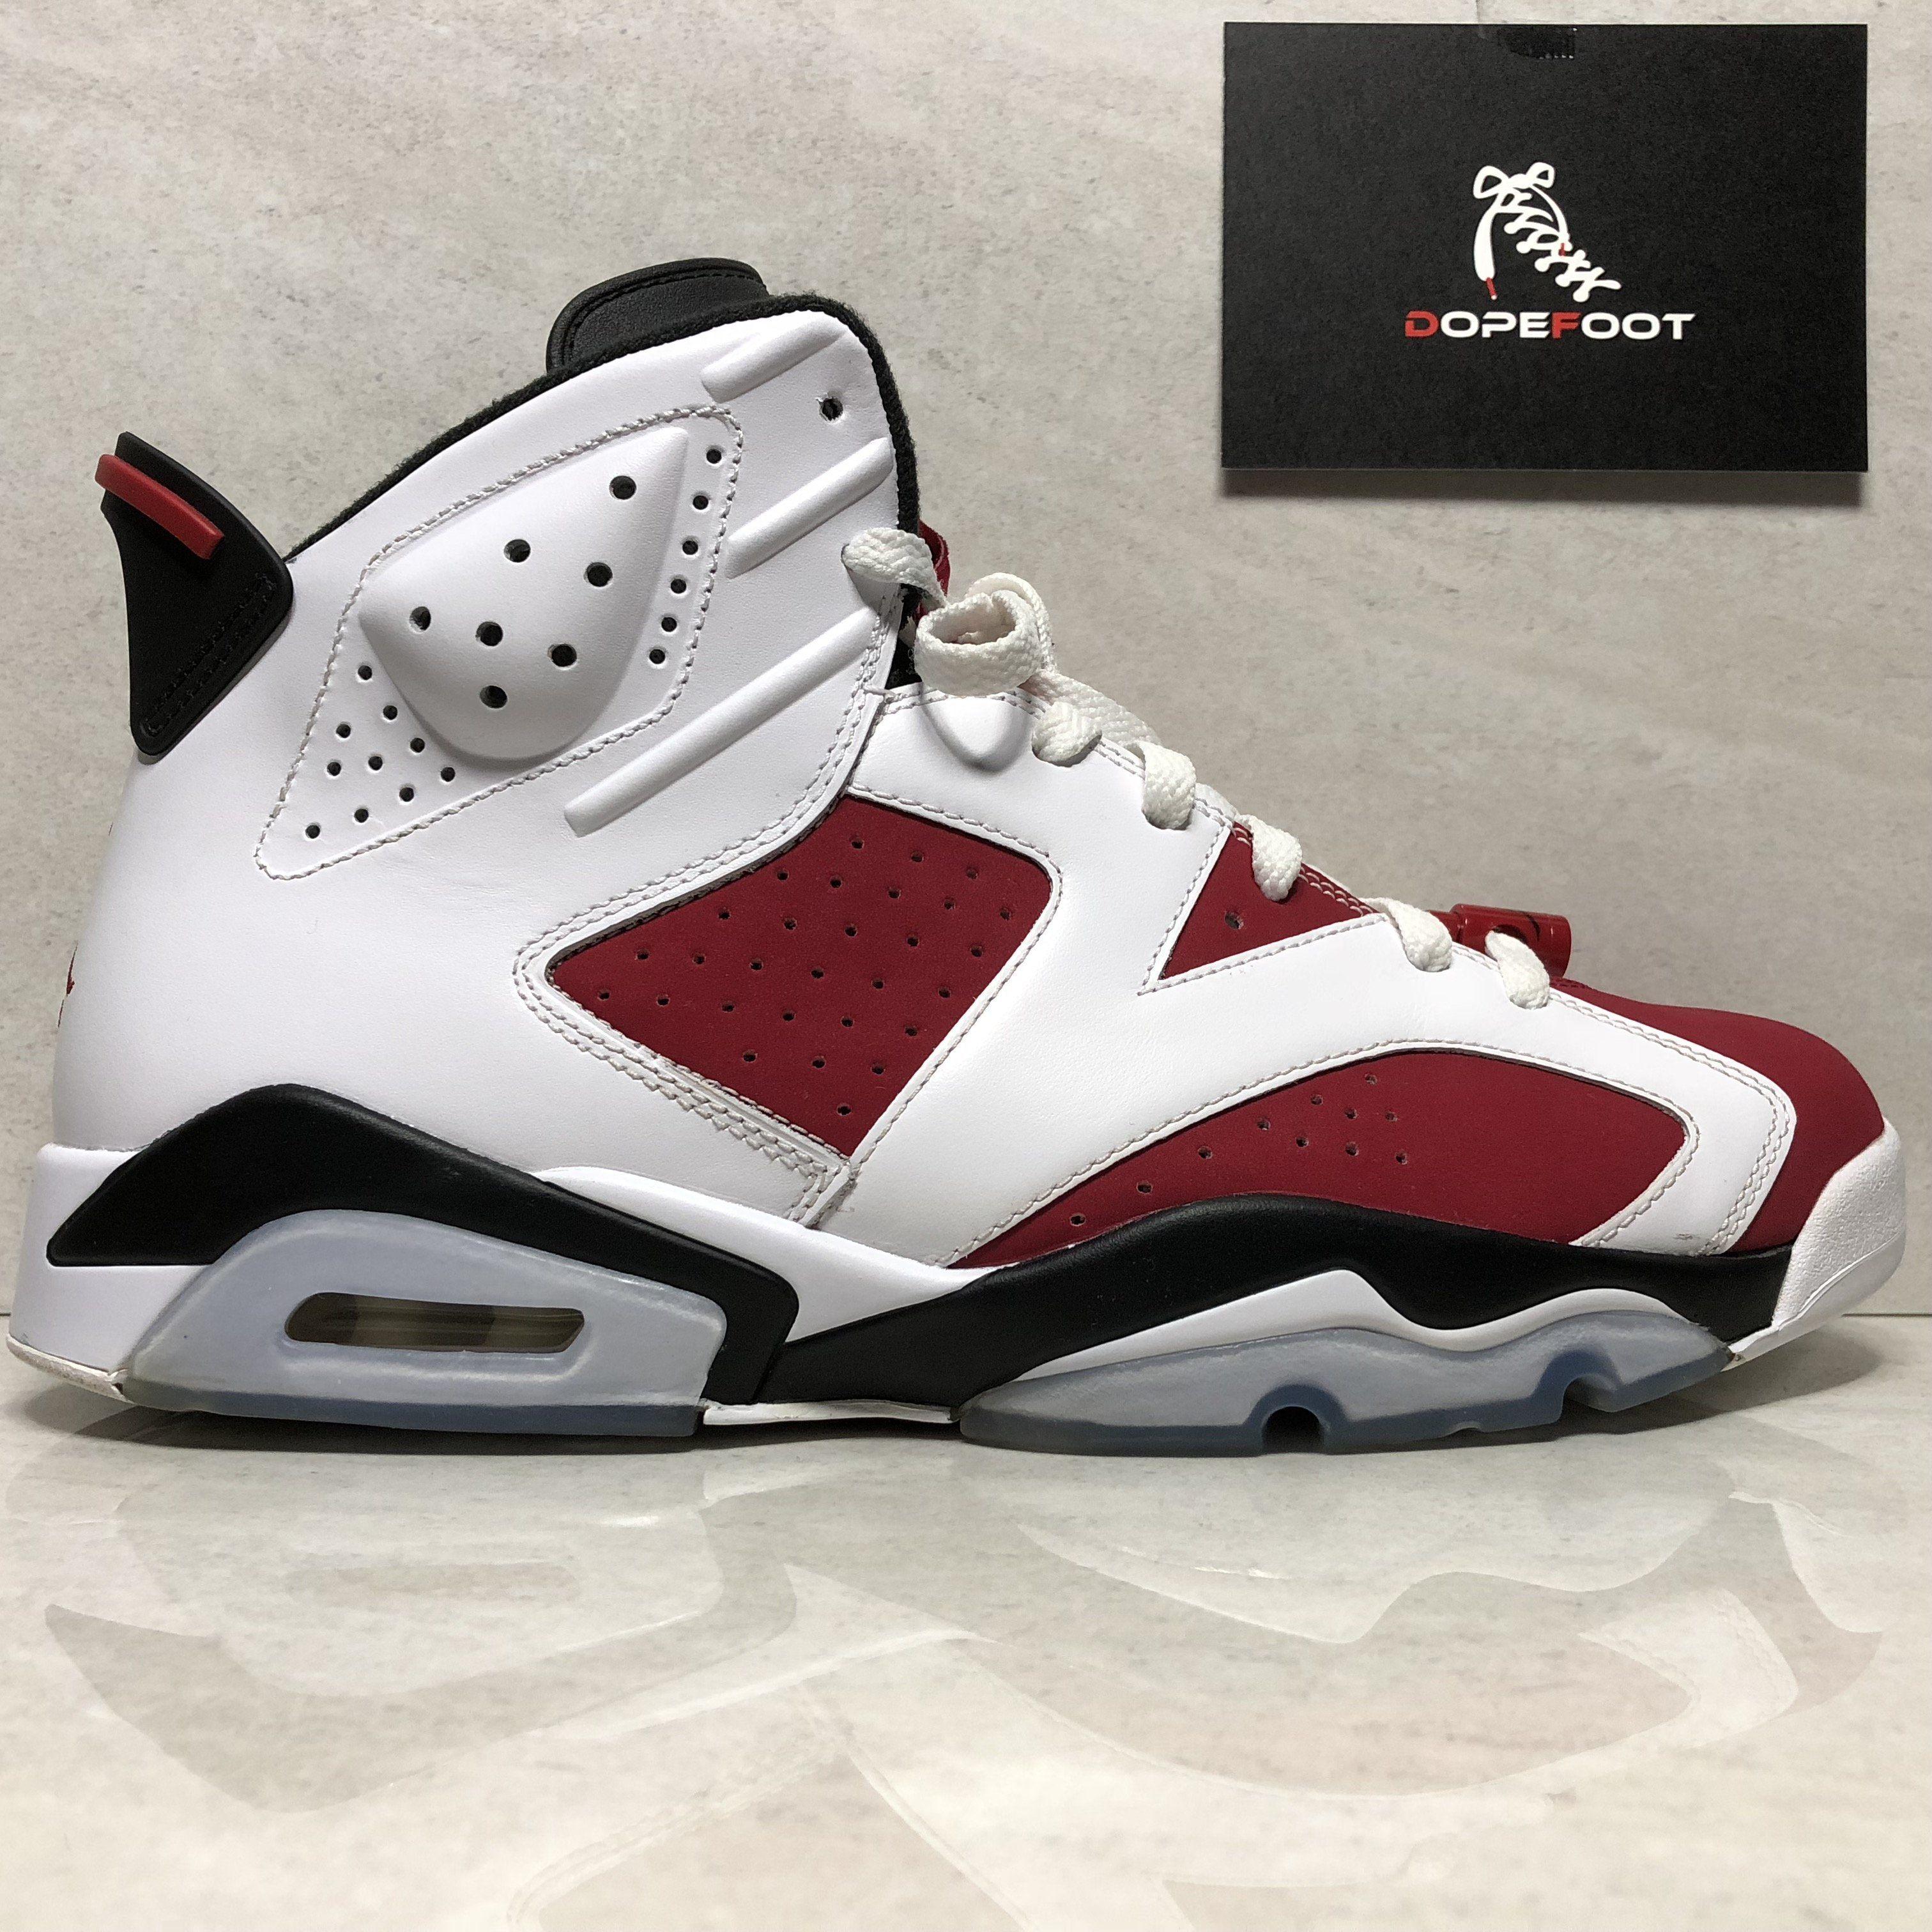 huge selection of bc7fa 355a2 Nike Air Jordan 6 VI Retro Carmine Size 12 WHITE/CARMINE ...